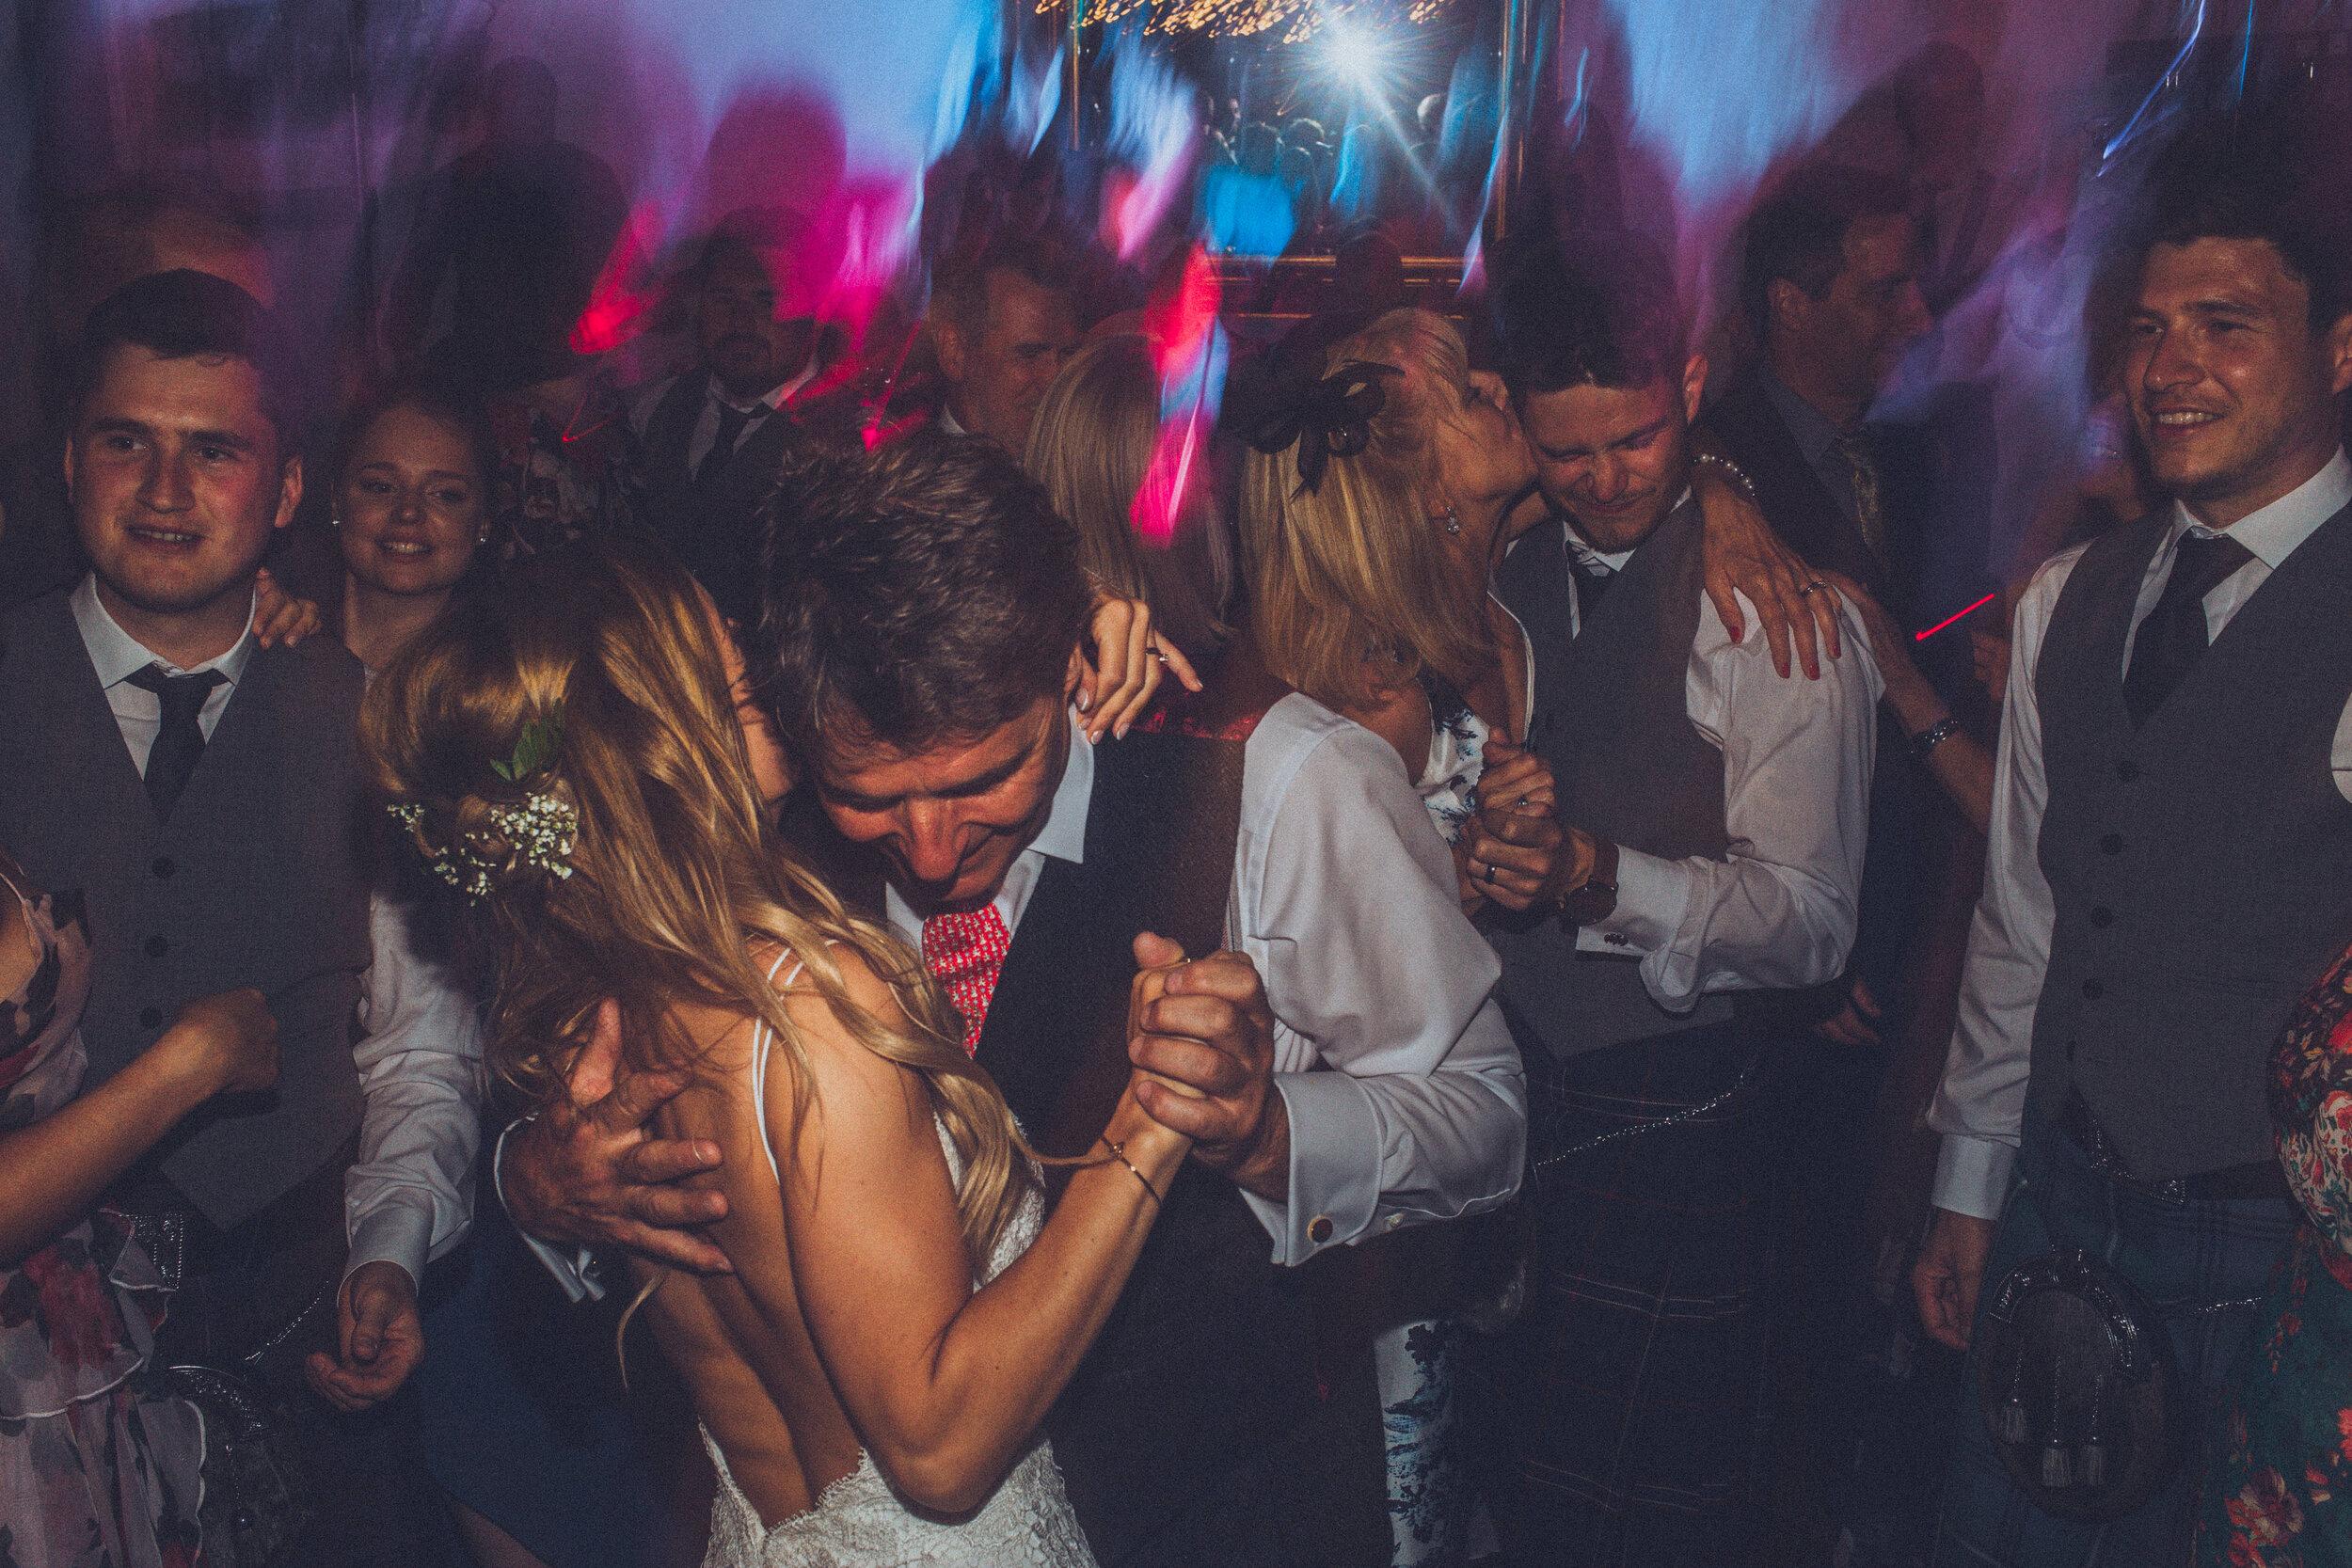 Dalduff Farm Ayrshire Wedding Photography - Claire Basiuk Photographer - 29.jpg